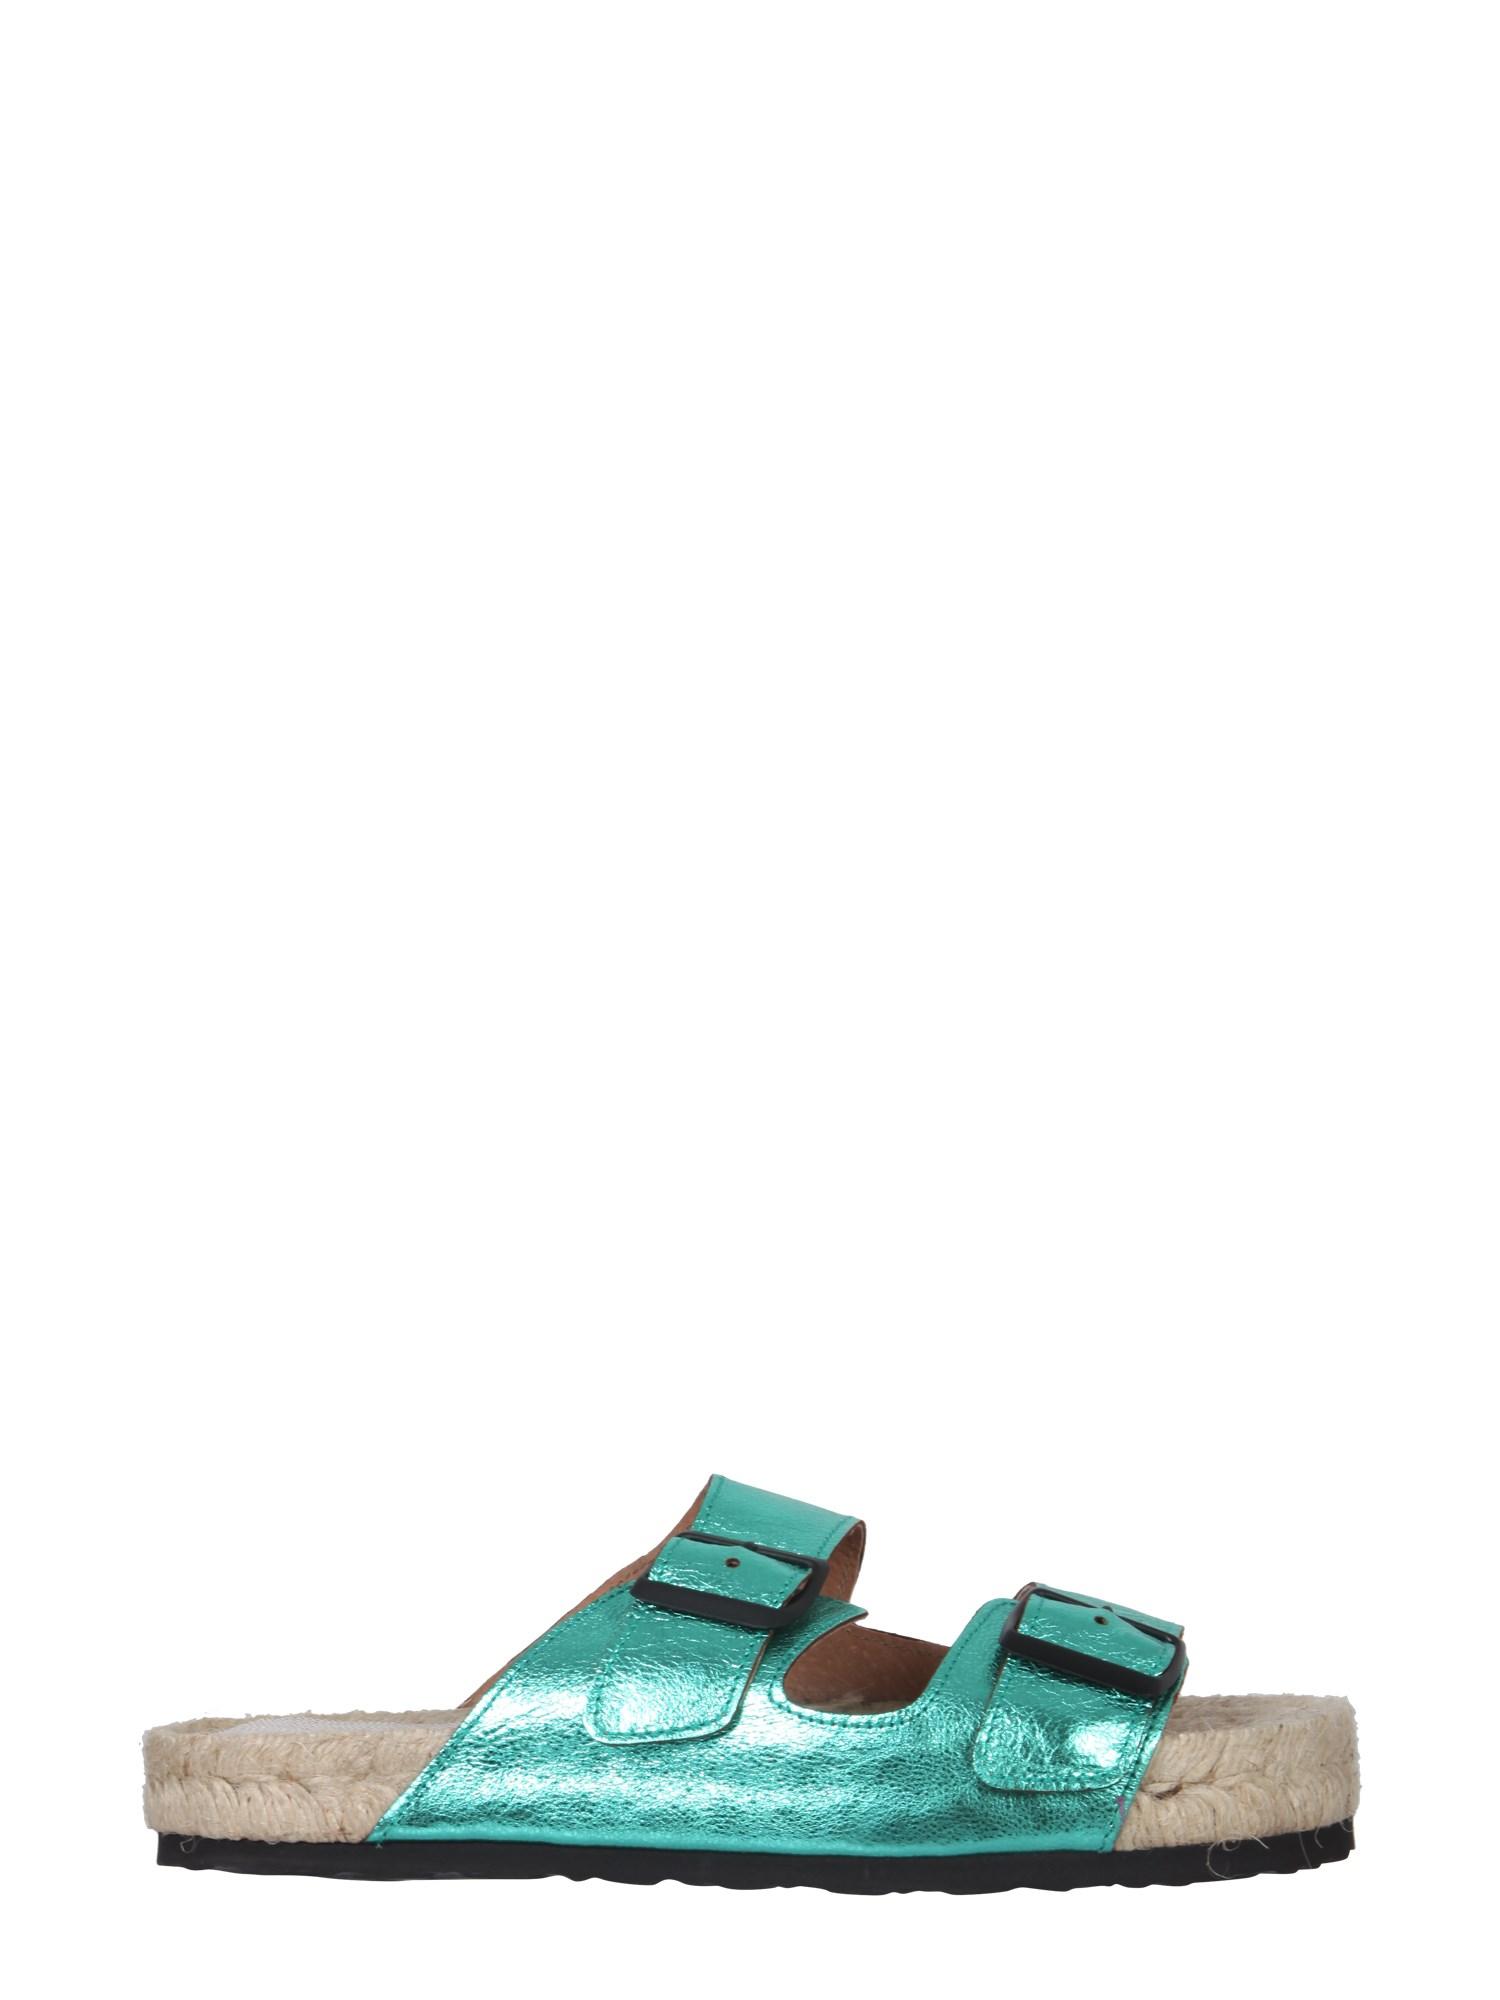 Manebi nordic hollywood sandals - manebi - Modalova